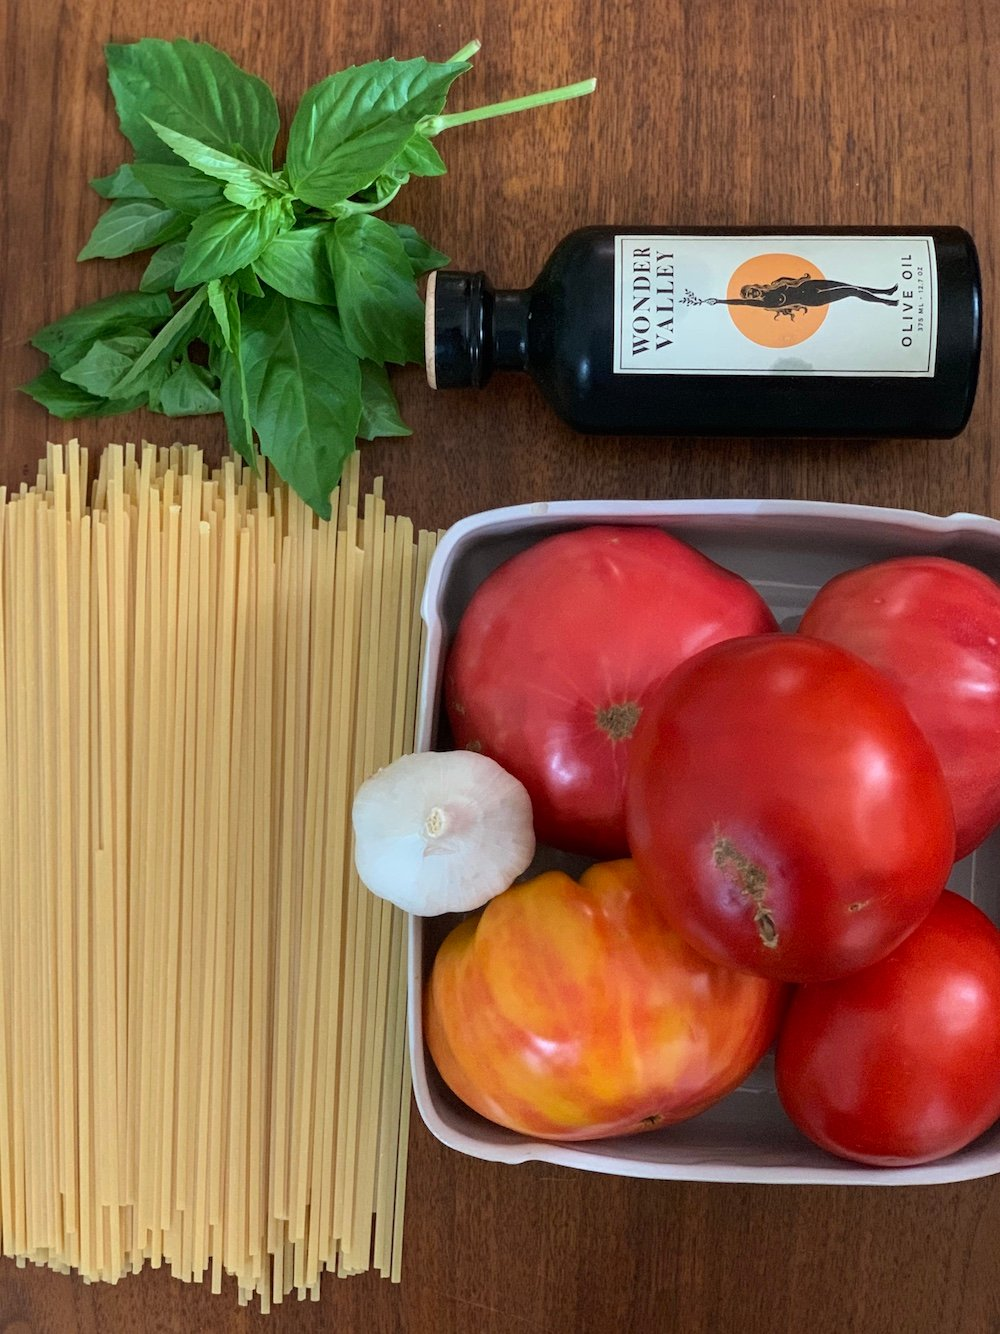 The Nora Ephron Tomato Sauce I Make Every Year